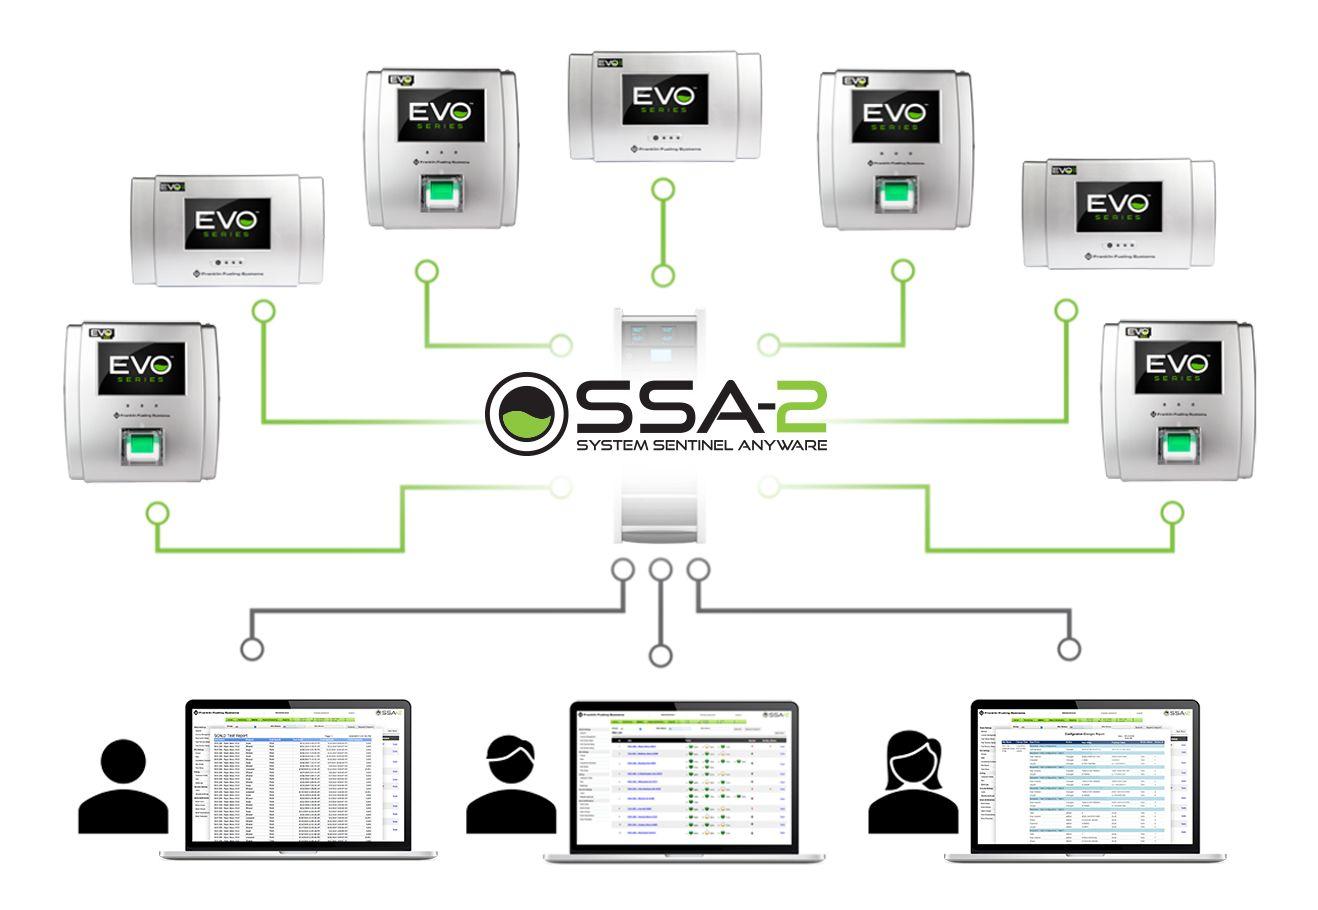 SSA-2 System Wide.psd